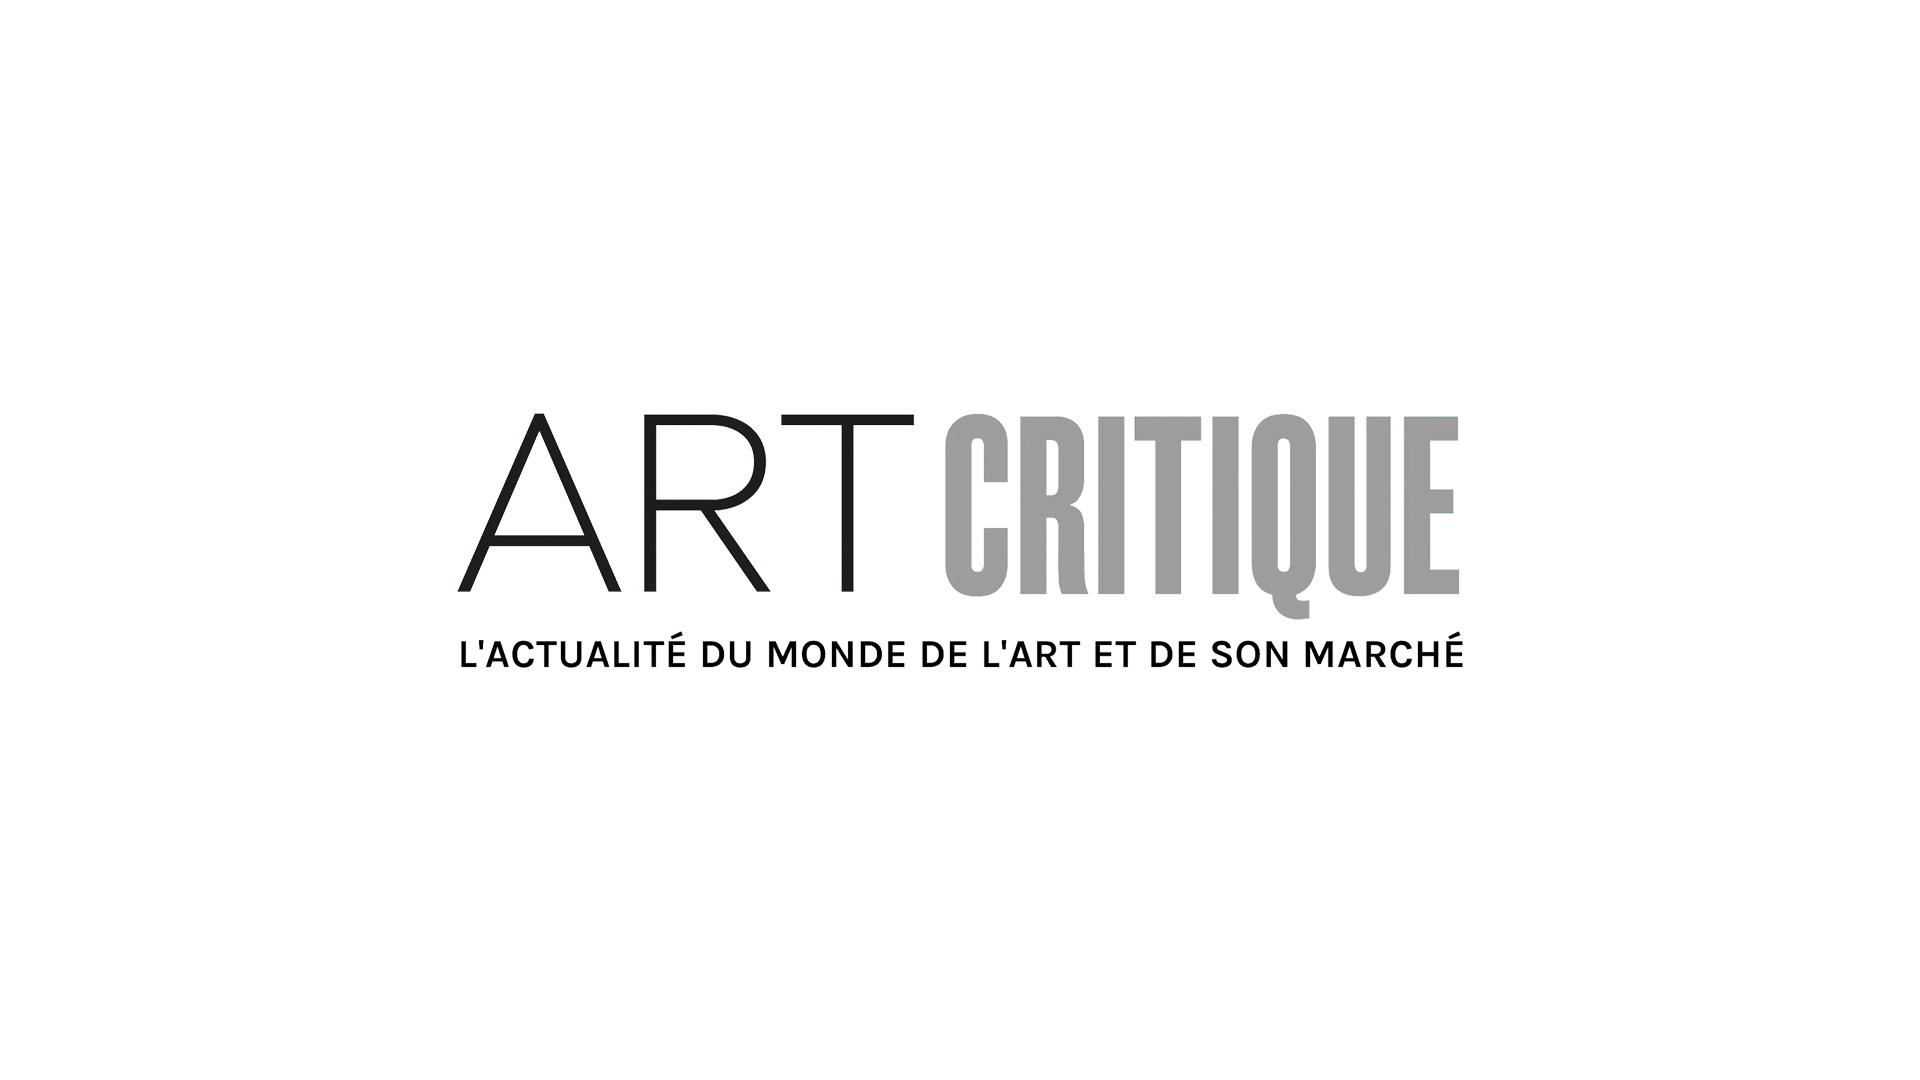 Robert Motherwell, une œuvre en perpétuel mouvement